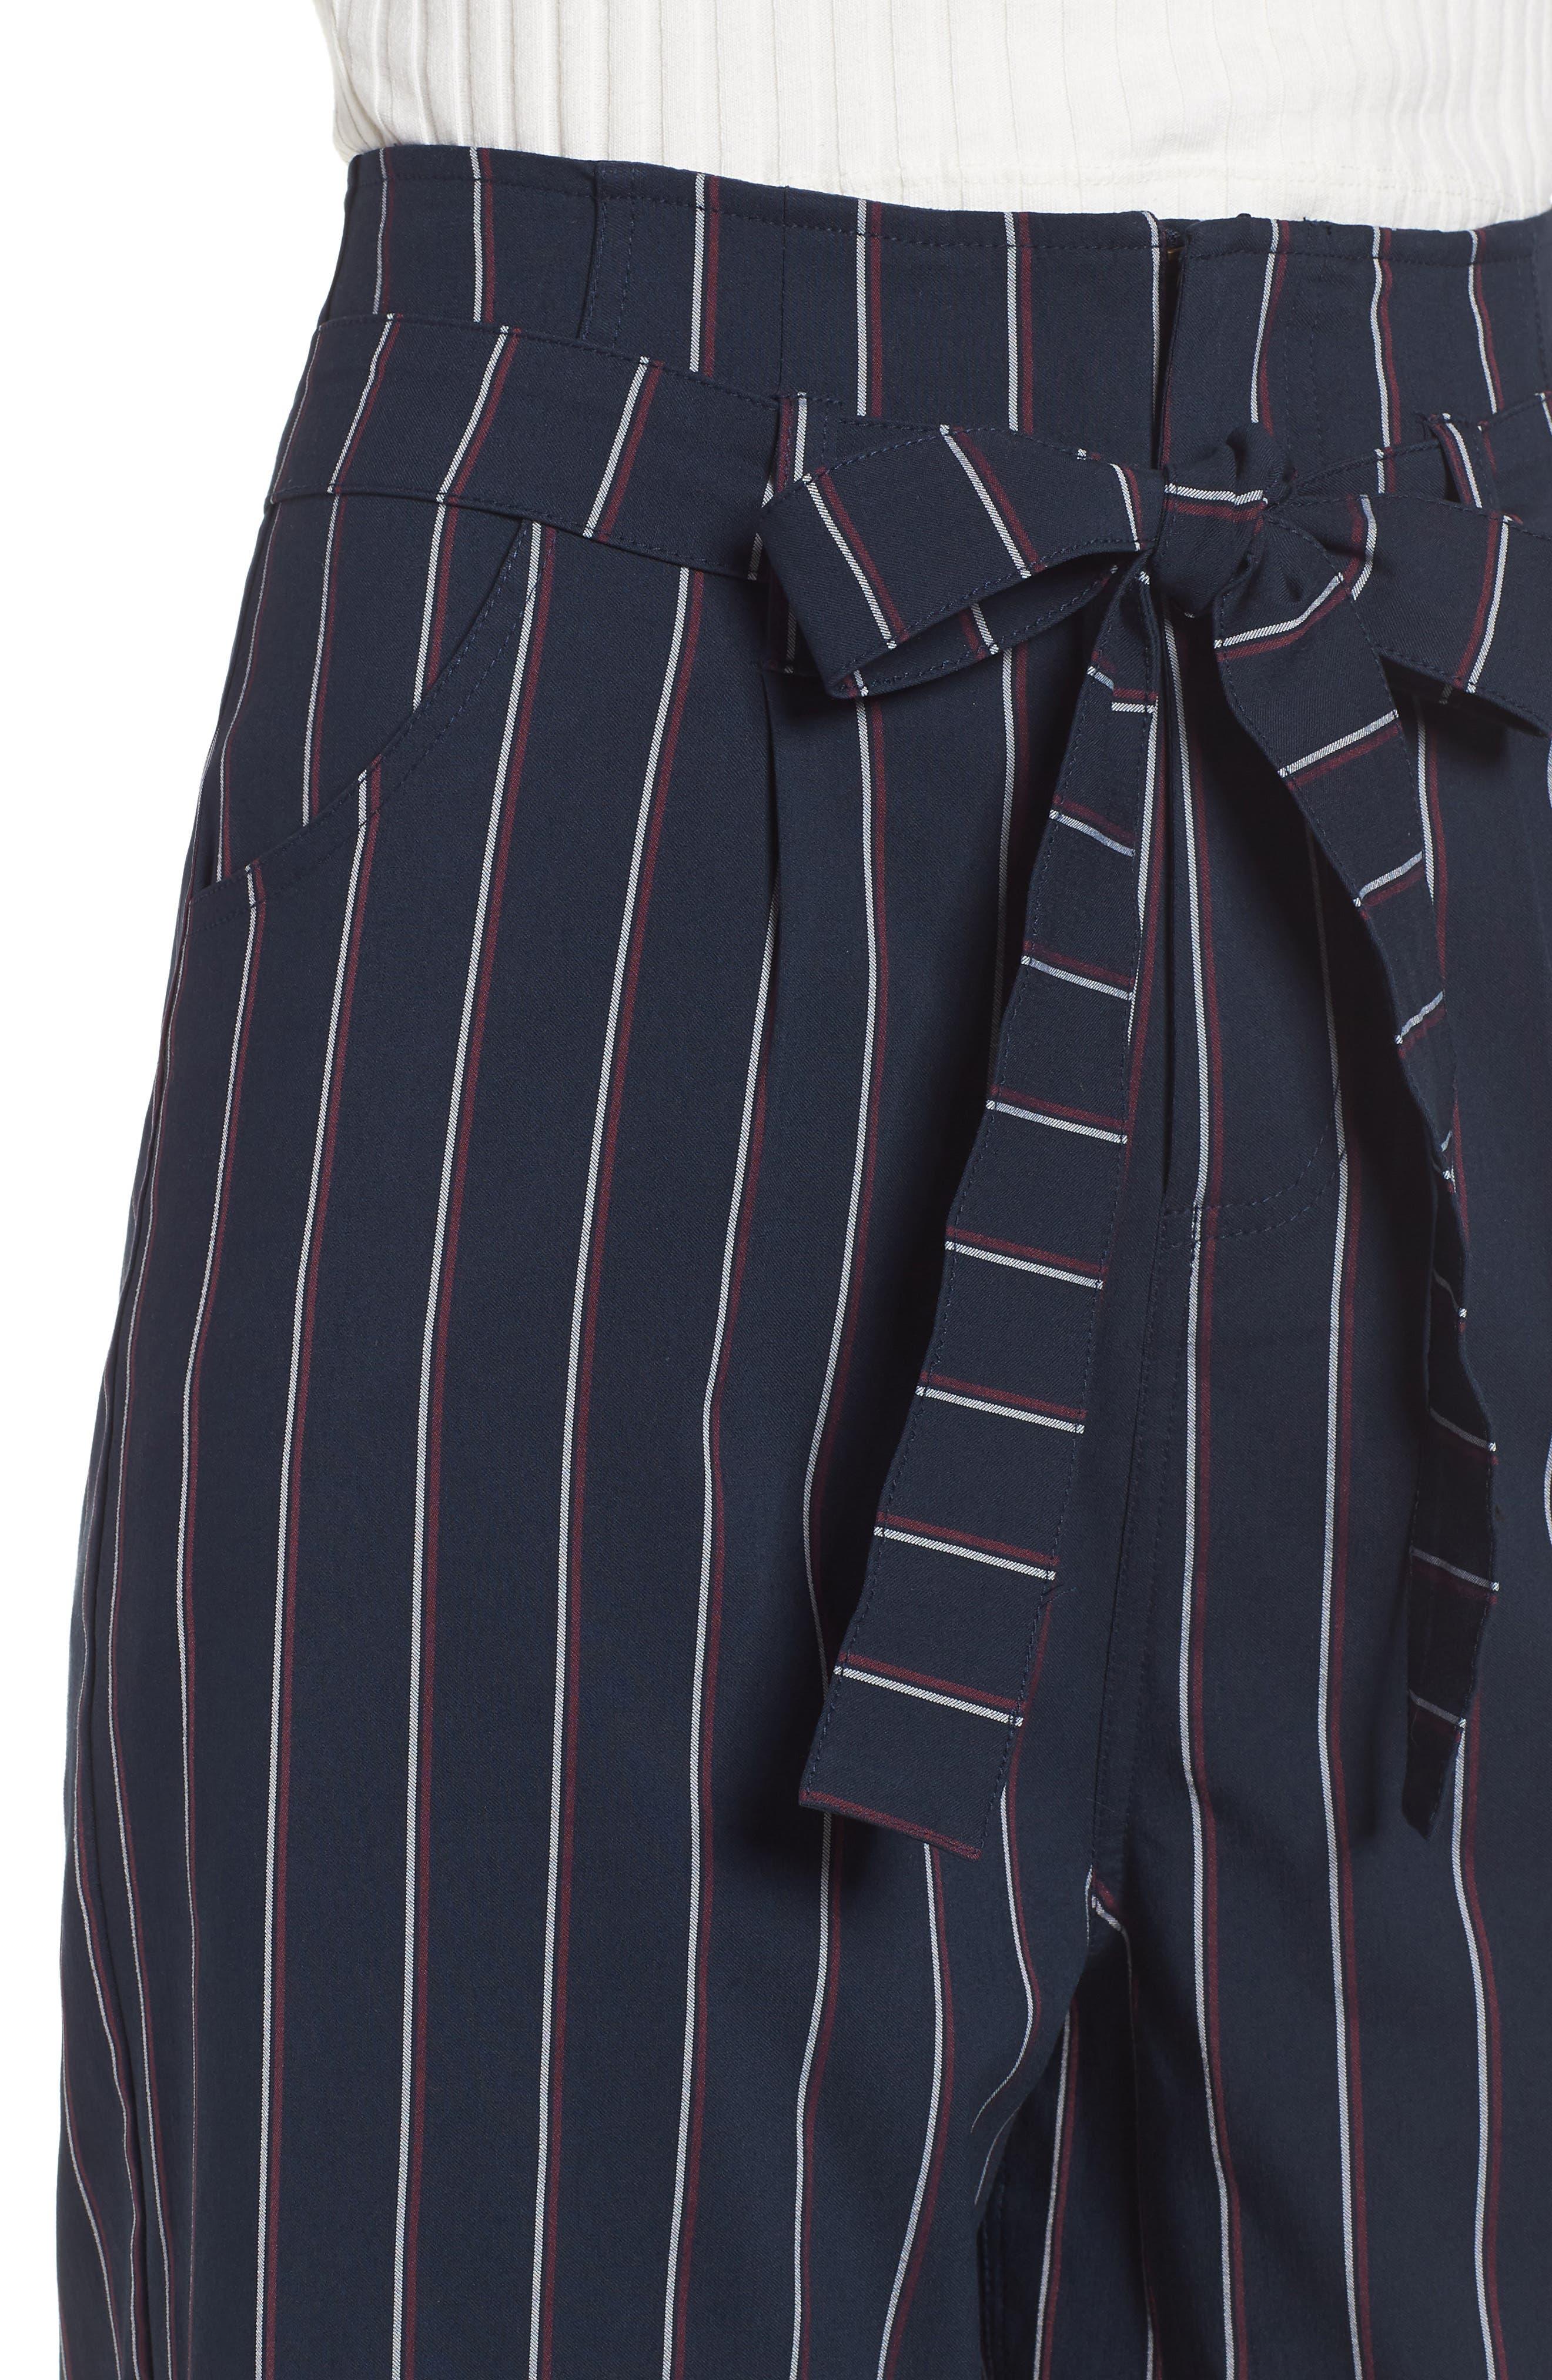 Tie Waist Crop Trousers,                             Alternate thumbnail 4, color,                             Navy Night Stripe